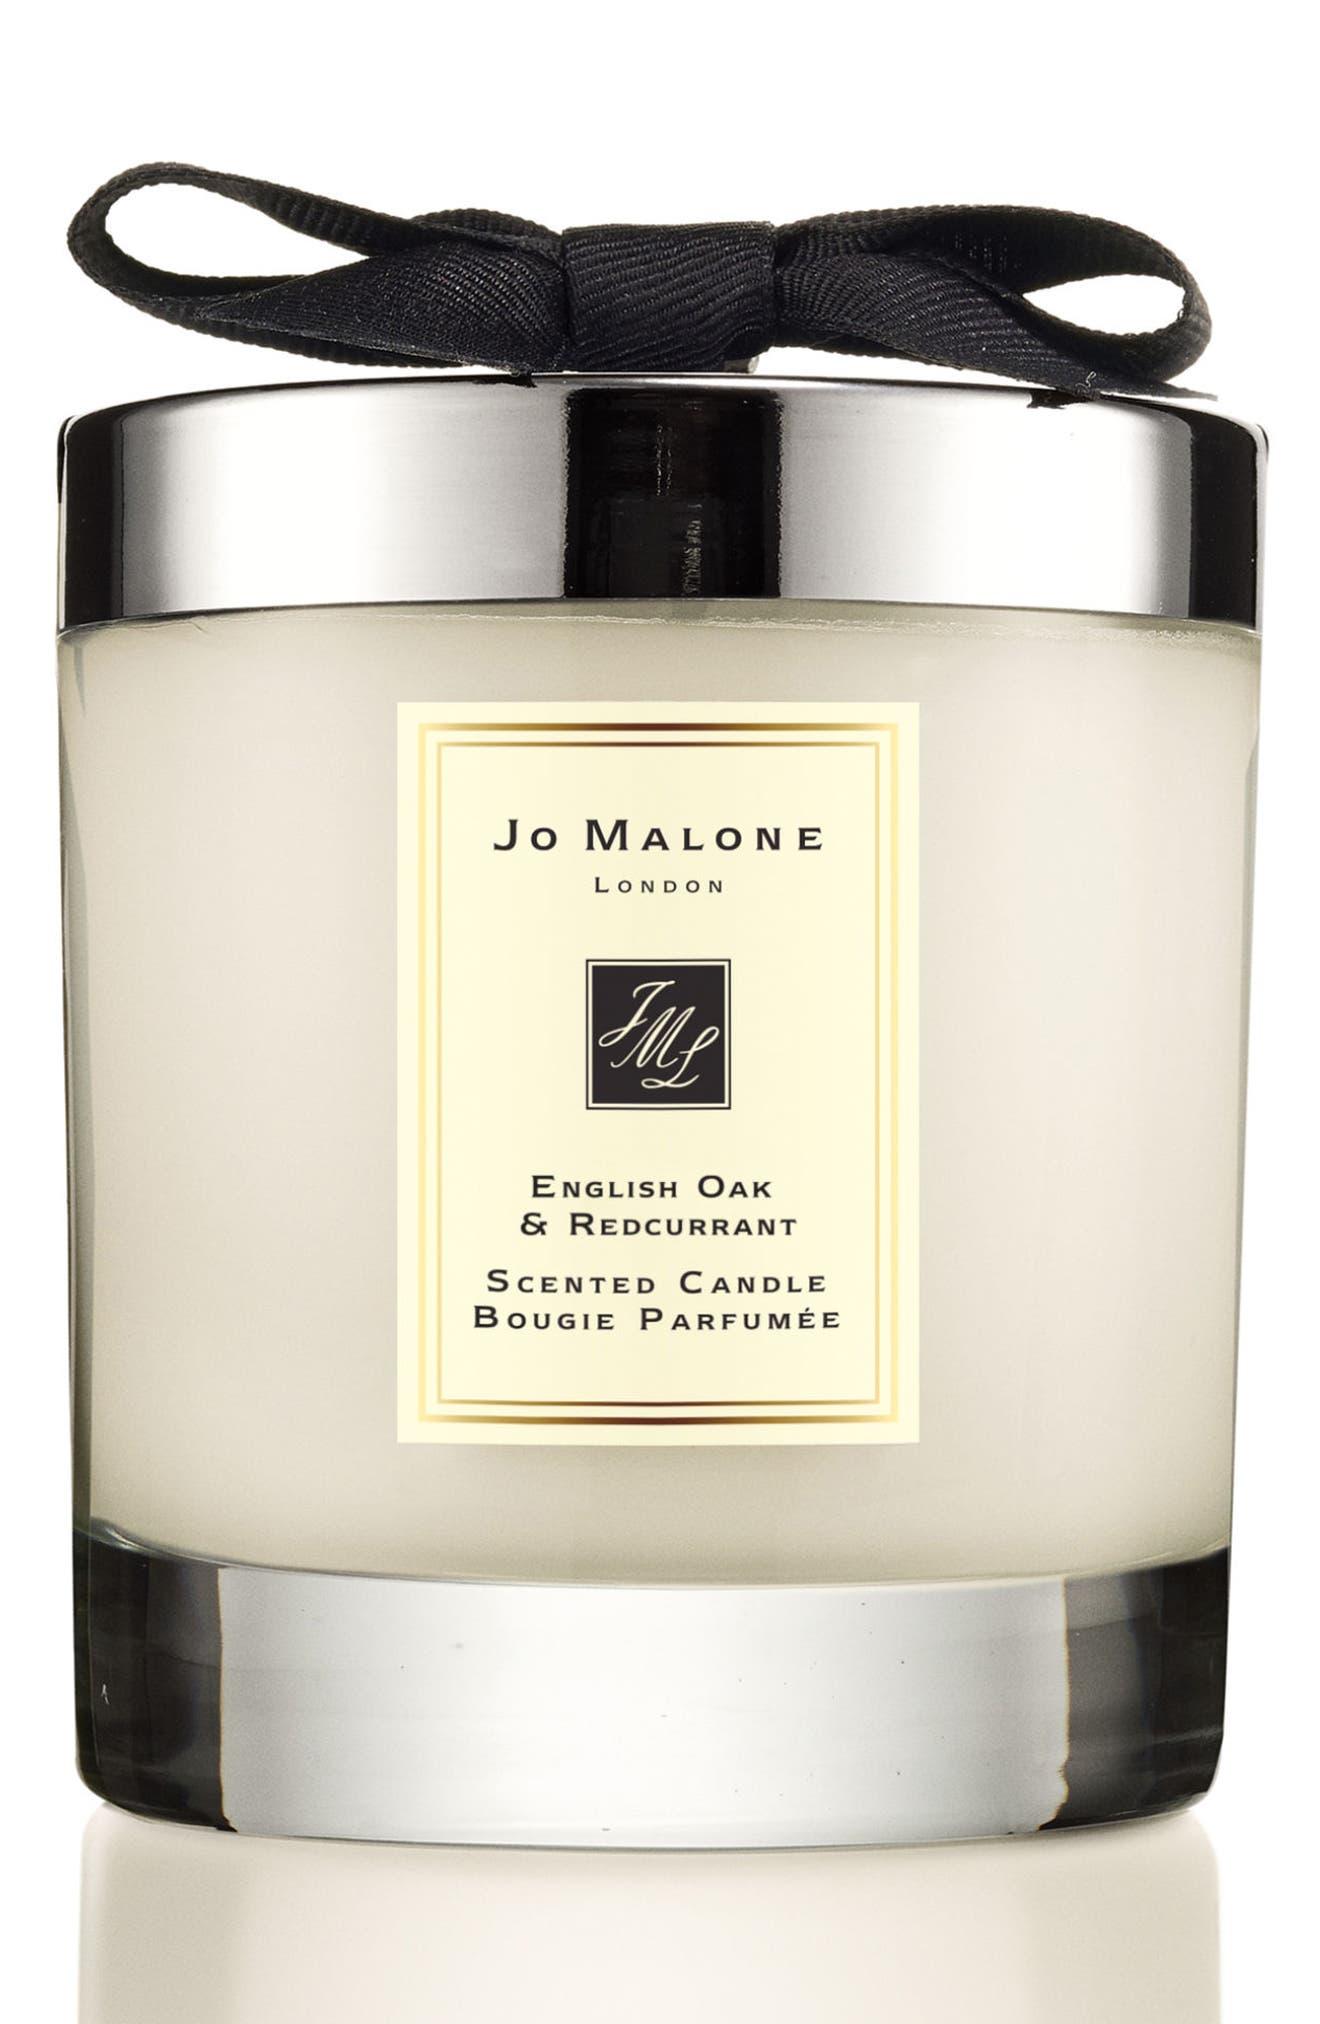 Jo Malone London™ English Oak & Redcurrant Candle